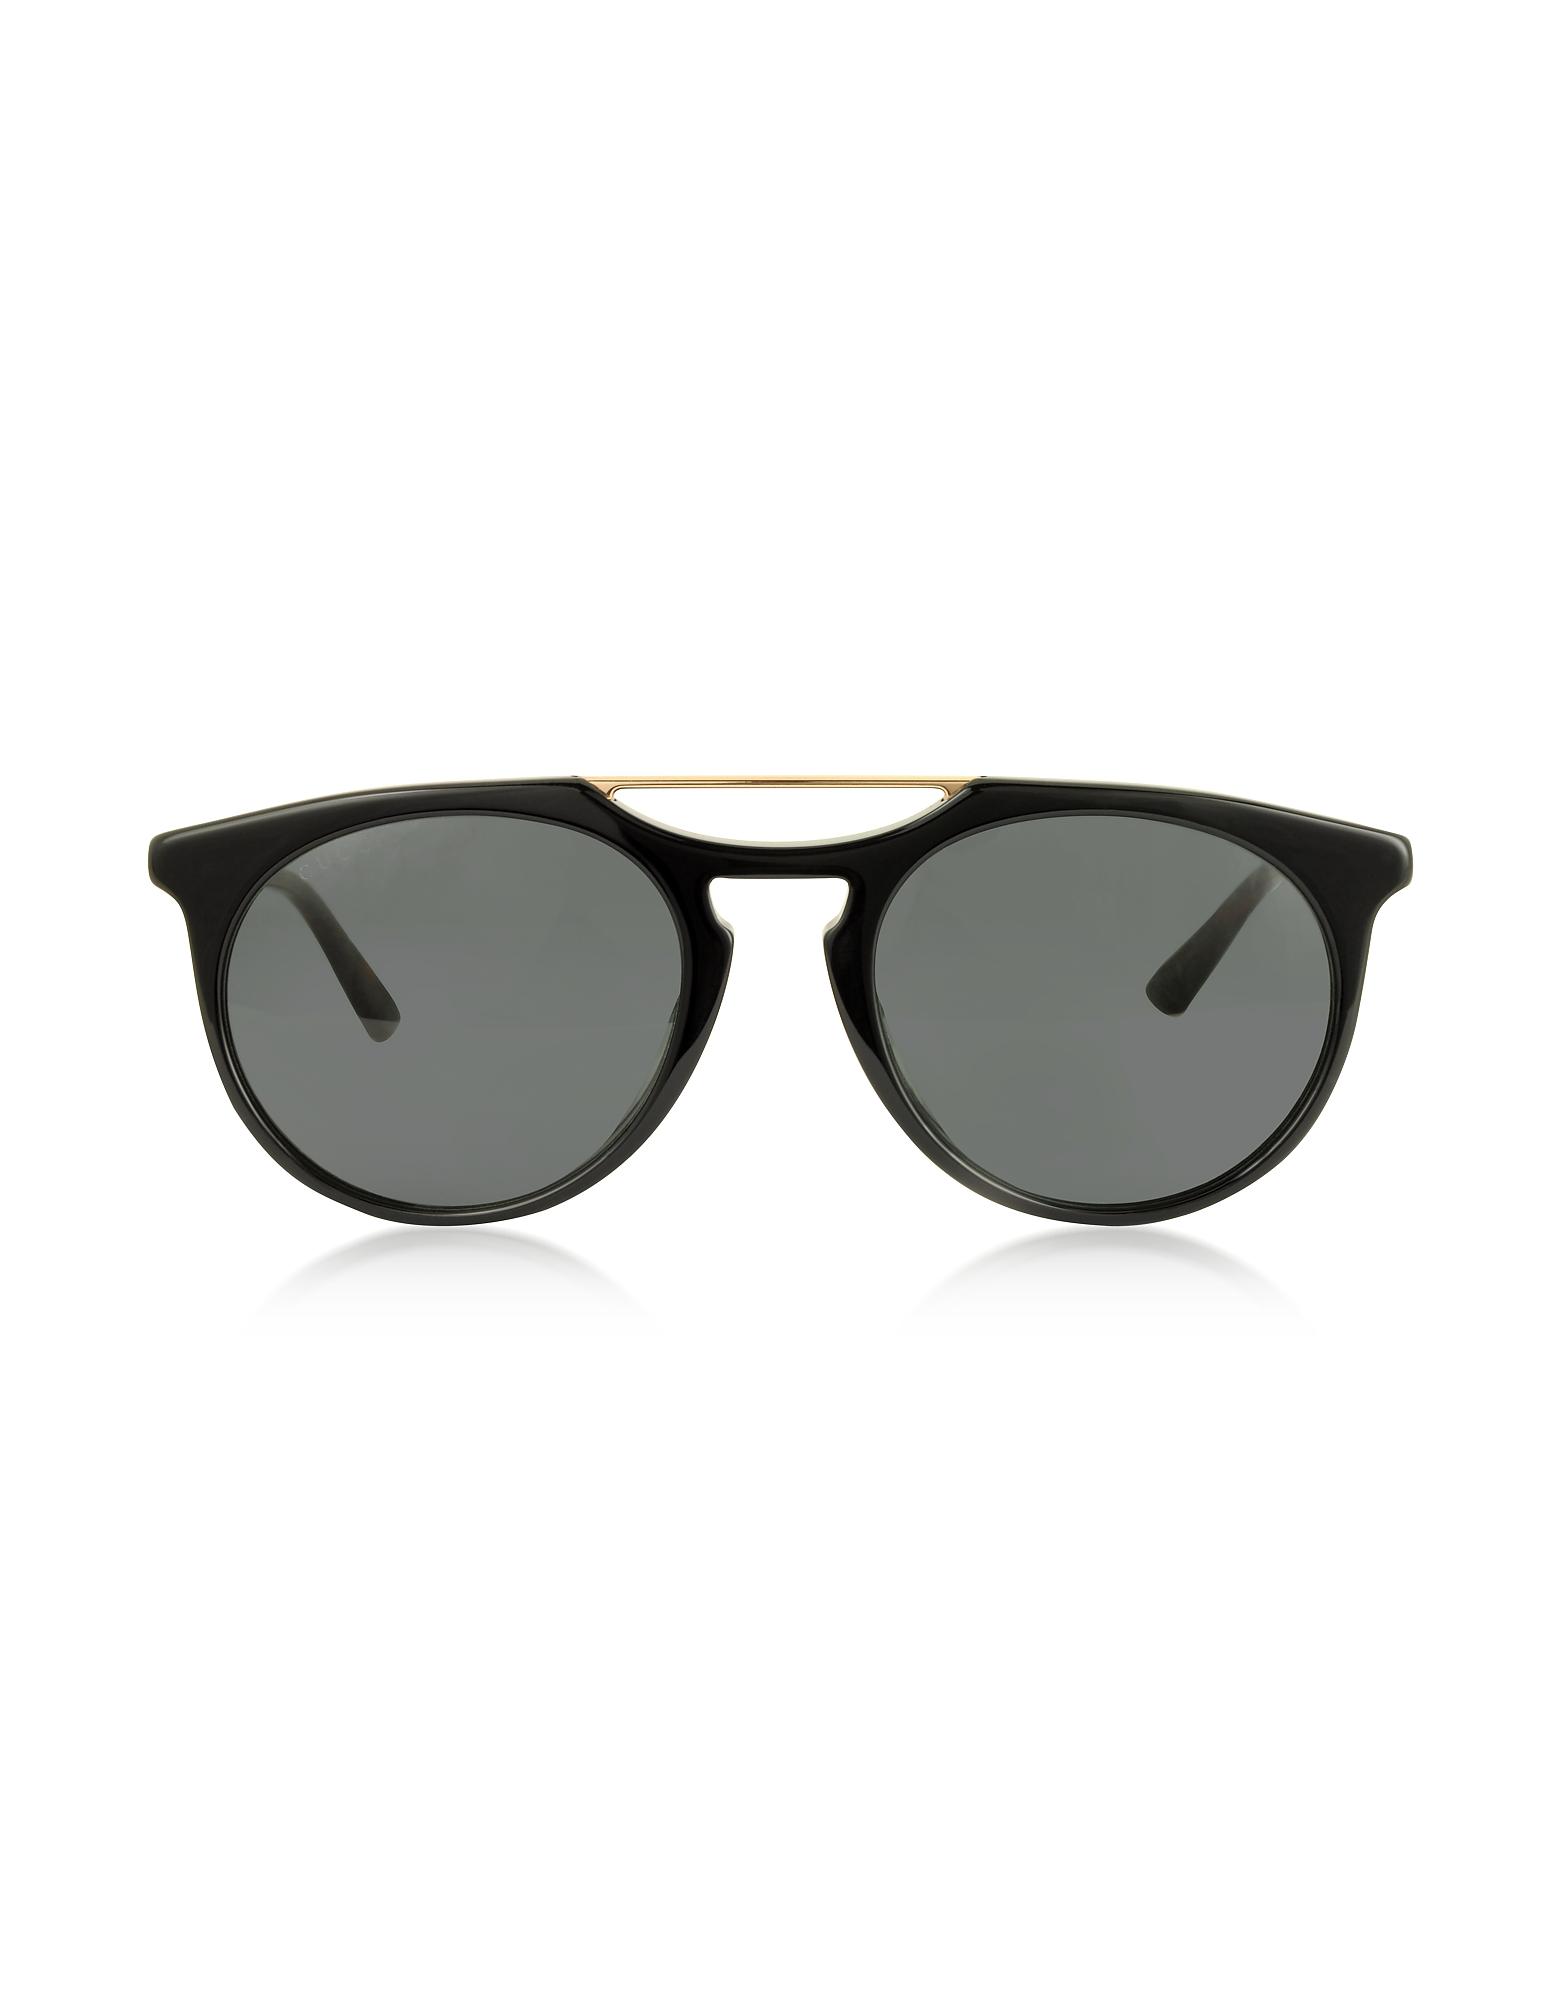 Gucci Gg0320S Round-Frame Acetate Sunglasses In Black Gold/Grey